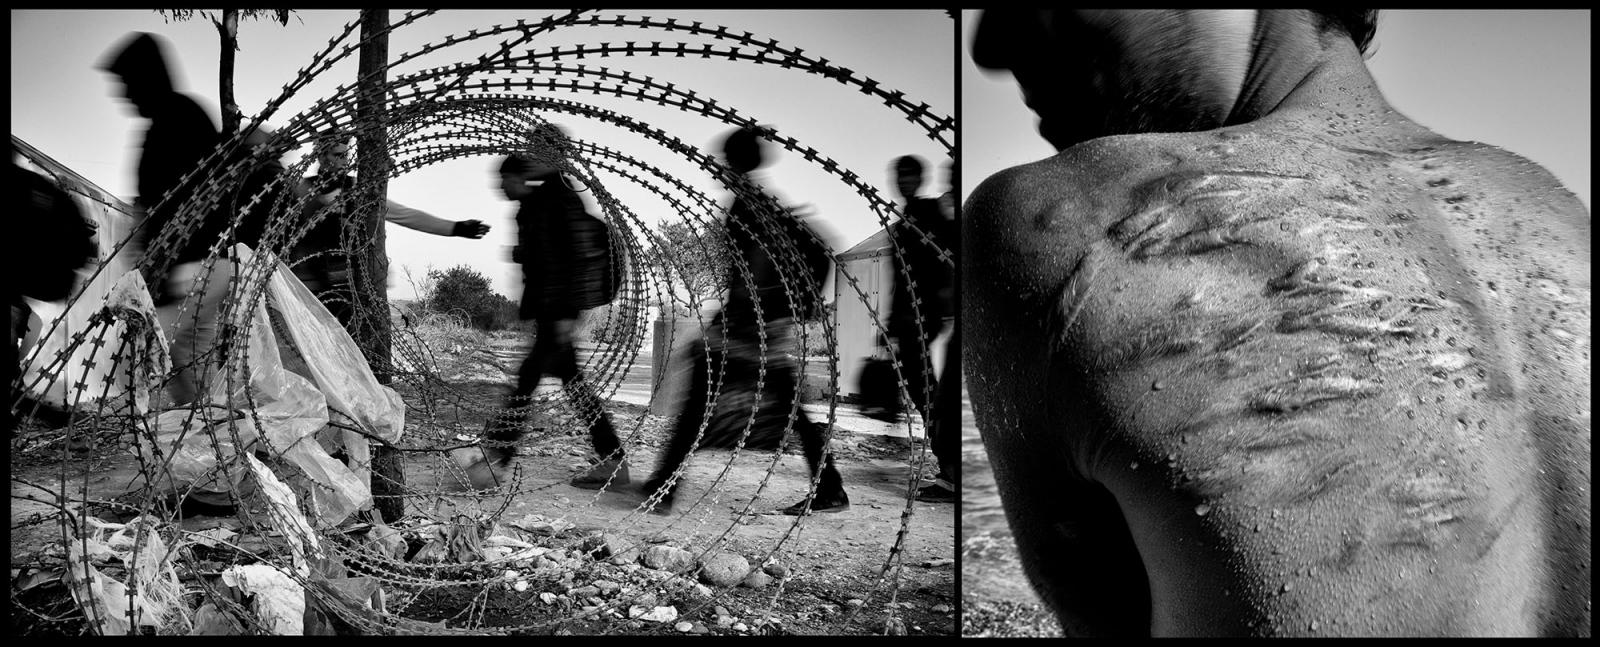 Art and Documentary Photography - Loading Nikos_Pilos_Stern_Goethe_institute_014.jpg